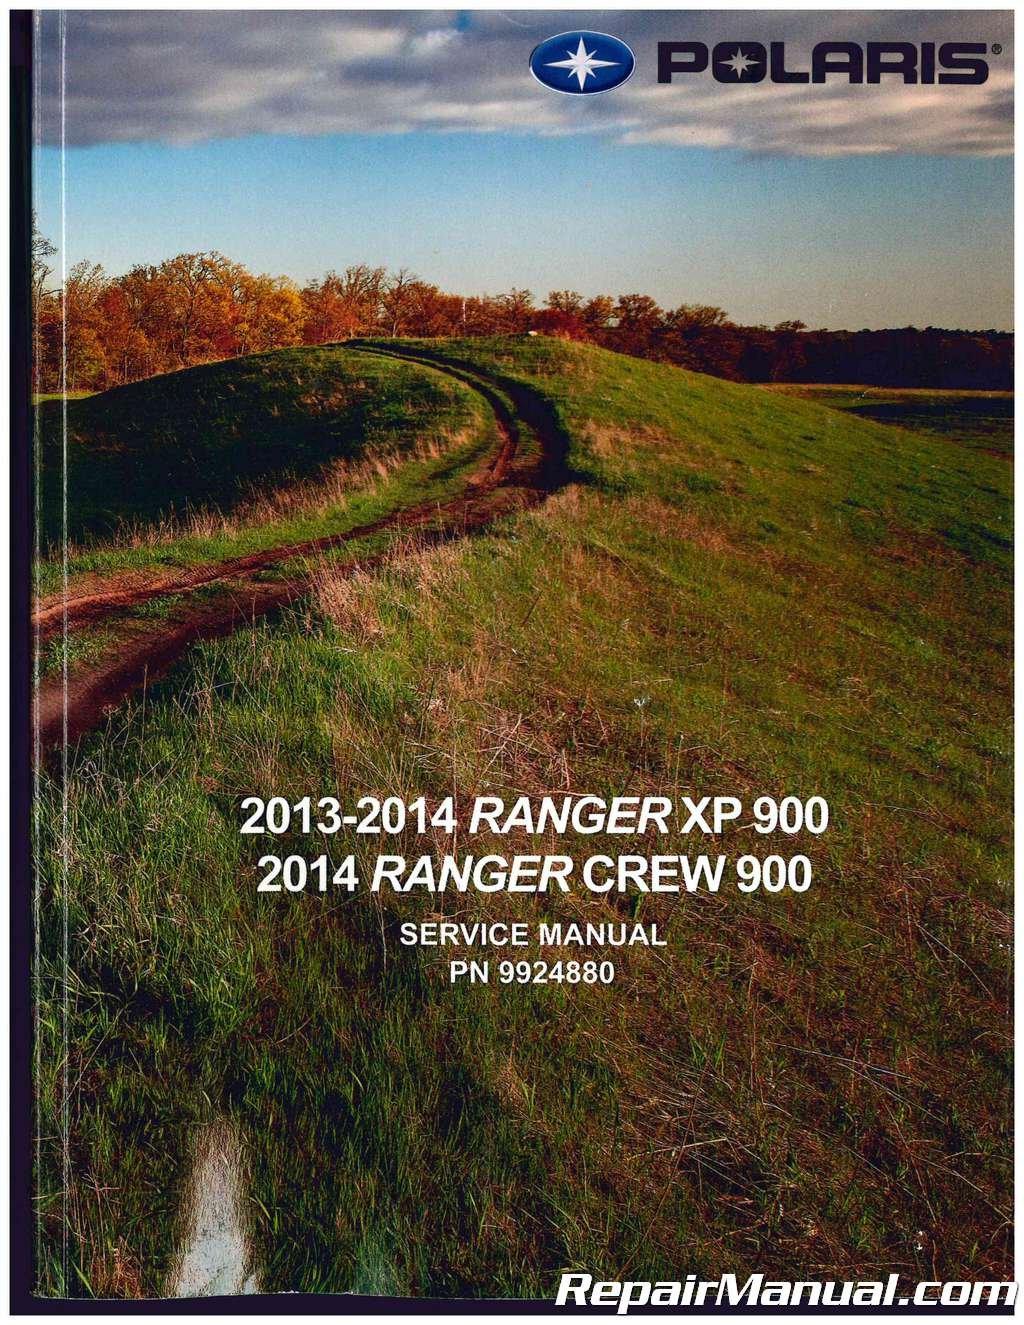 9924880 2013-2014 Polaris Ranger XP 900 2014 Ranger Crew 900 Side by Side Service  Manual: Manufacturer: Amazon.com: Books